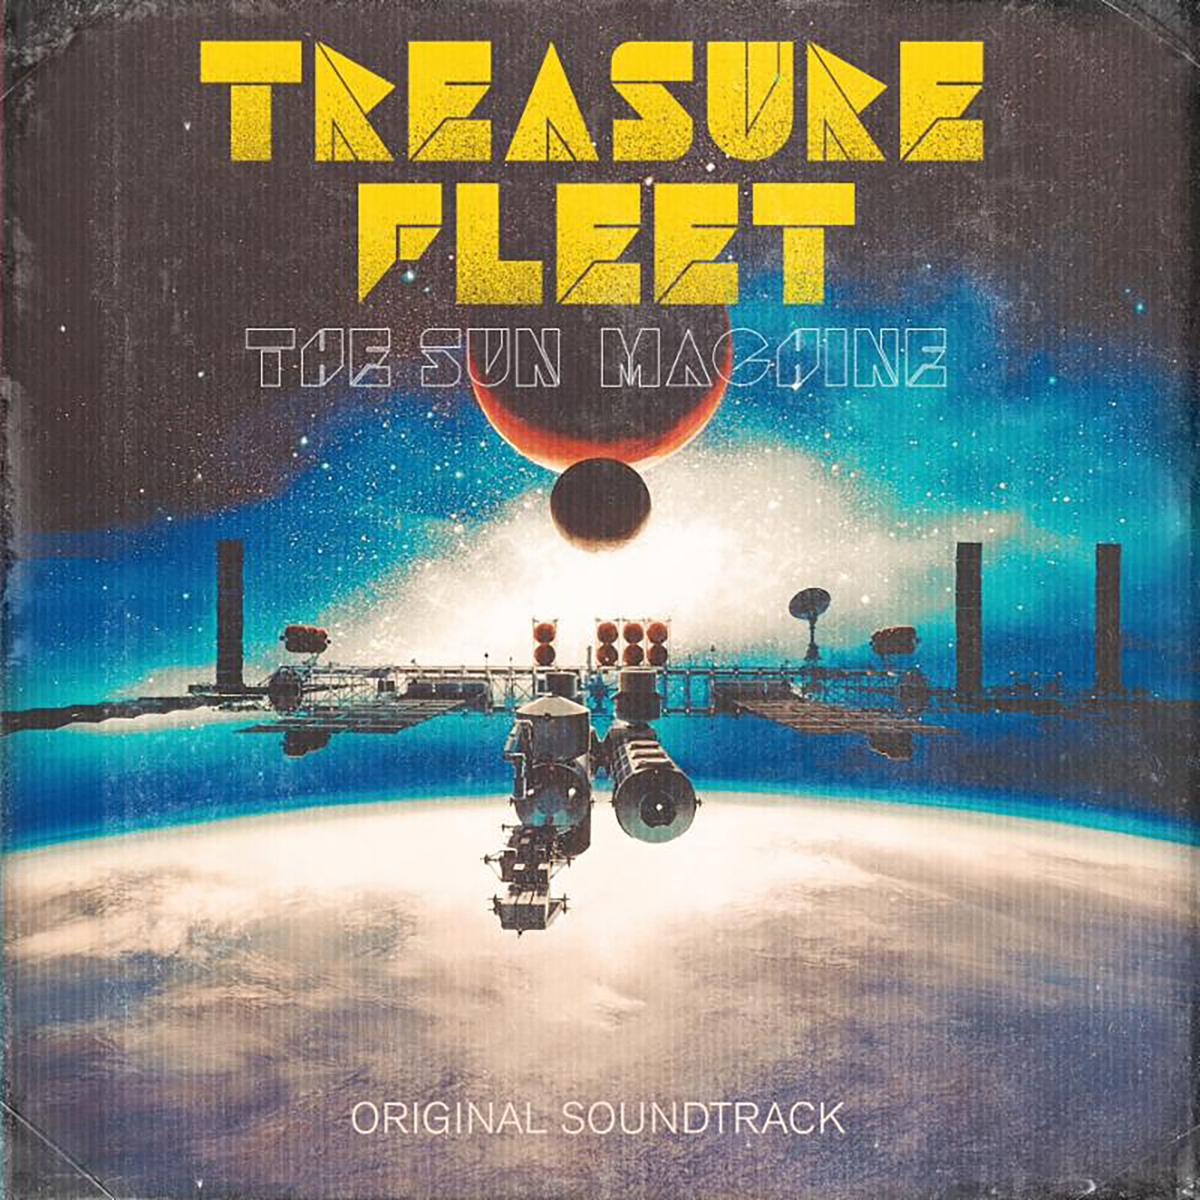 Treasure Fleet - The Sun Machine LP